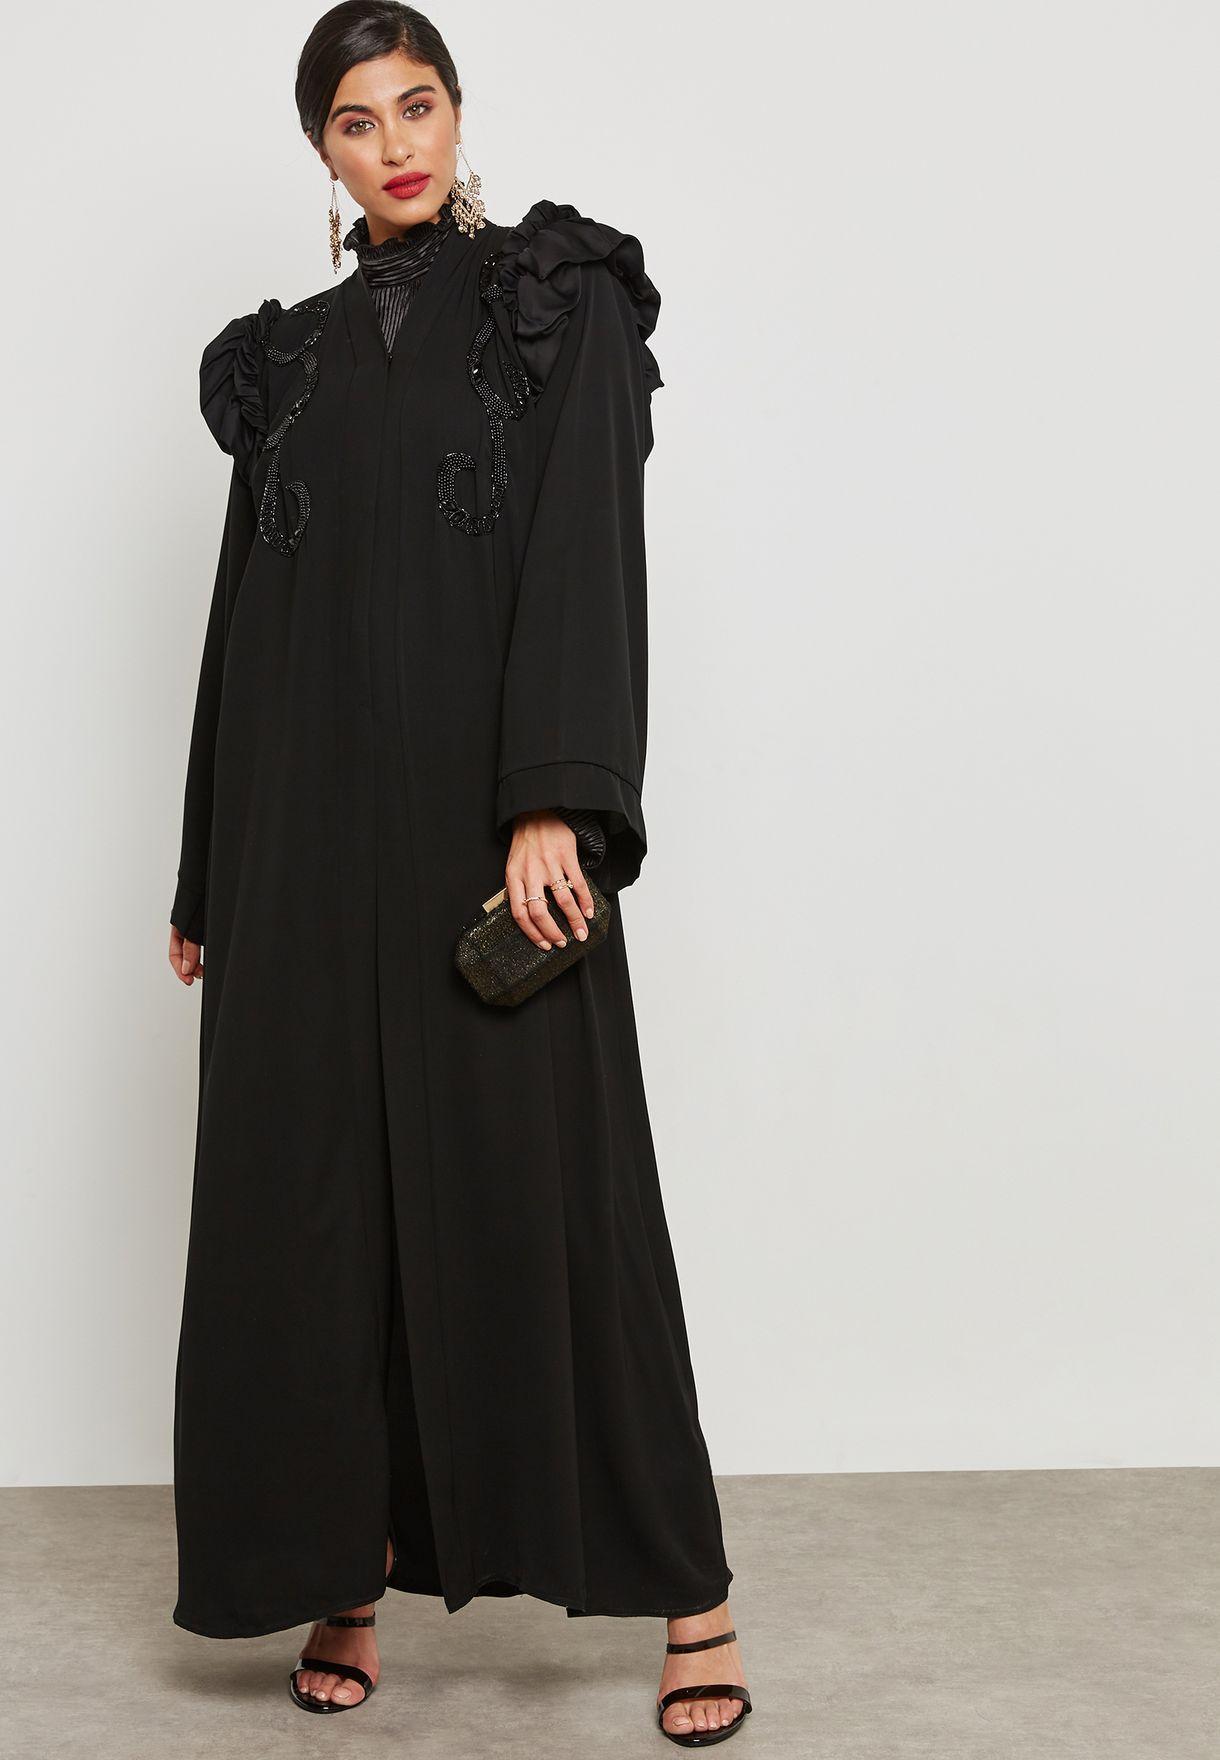 Embroidered Top Ruched Shoulder Abaya